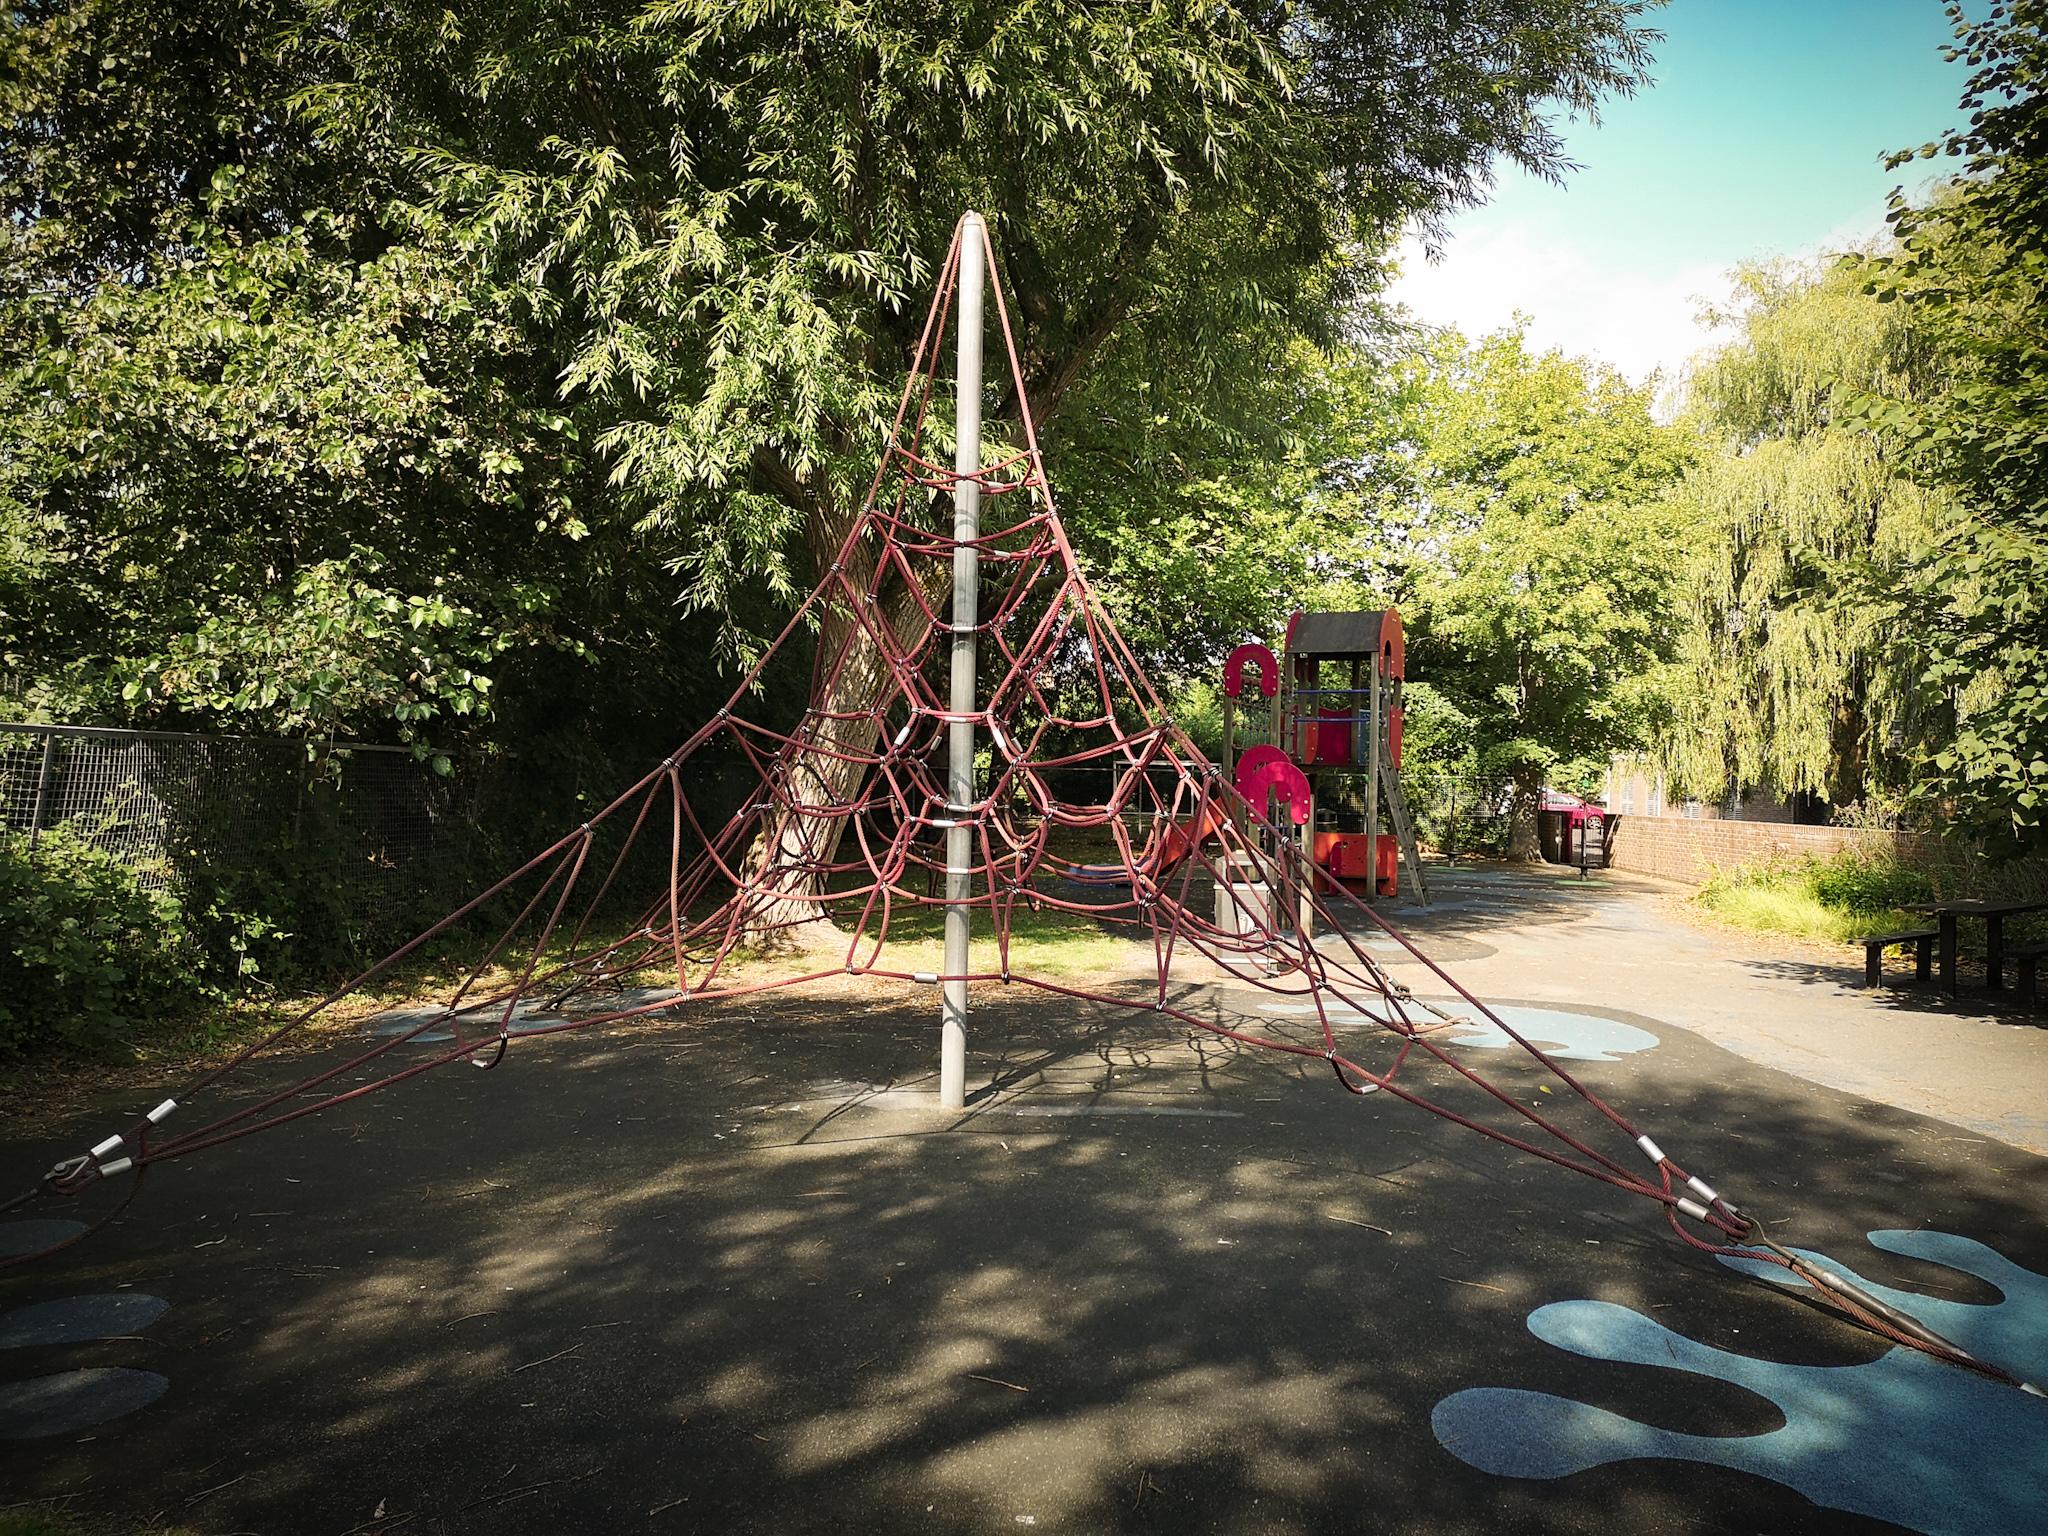 2508-2019-01306921710863616603North Walls playground by Hampshire Photographer Evie Winter52.jpeg